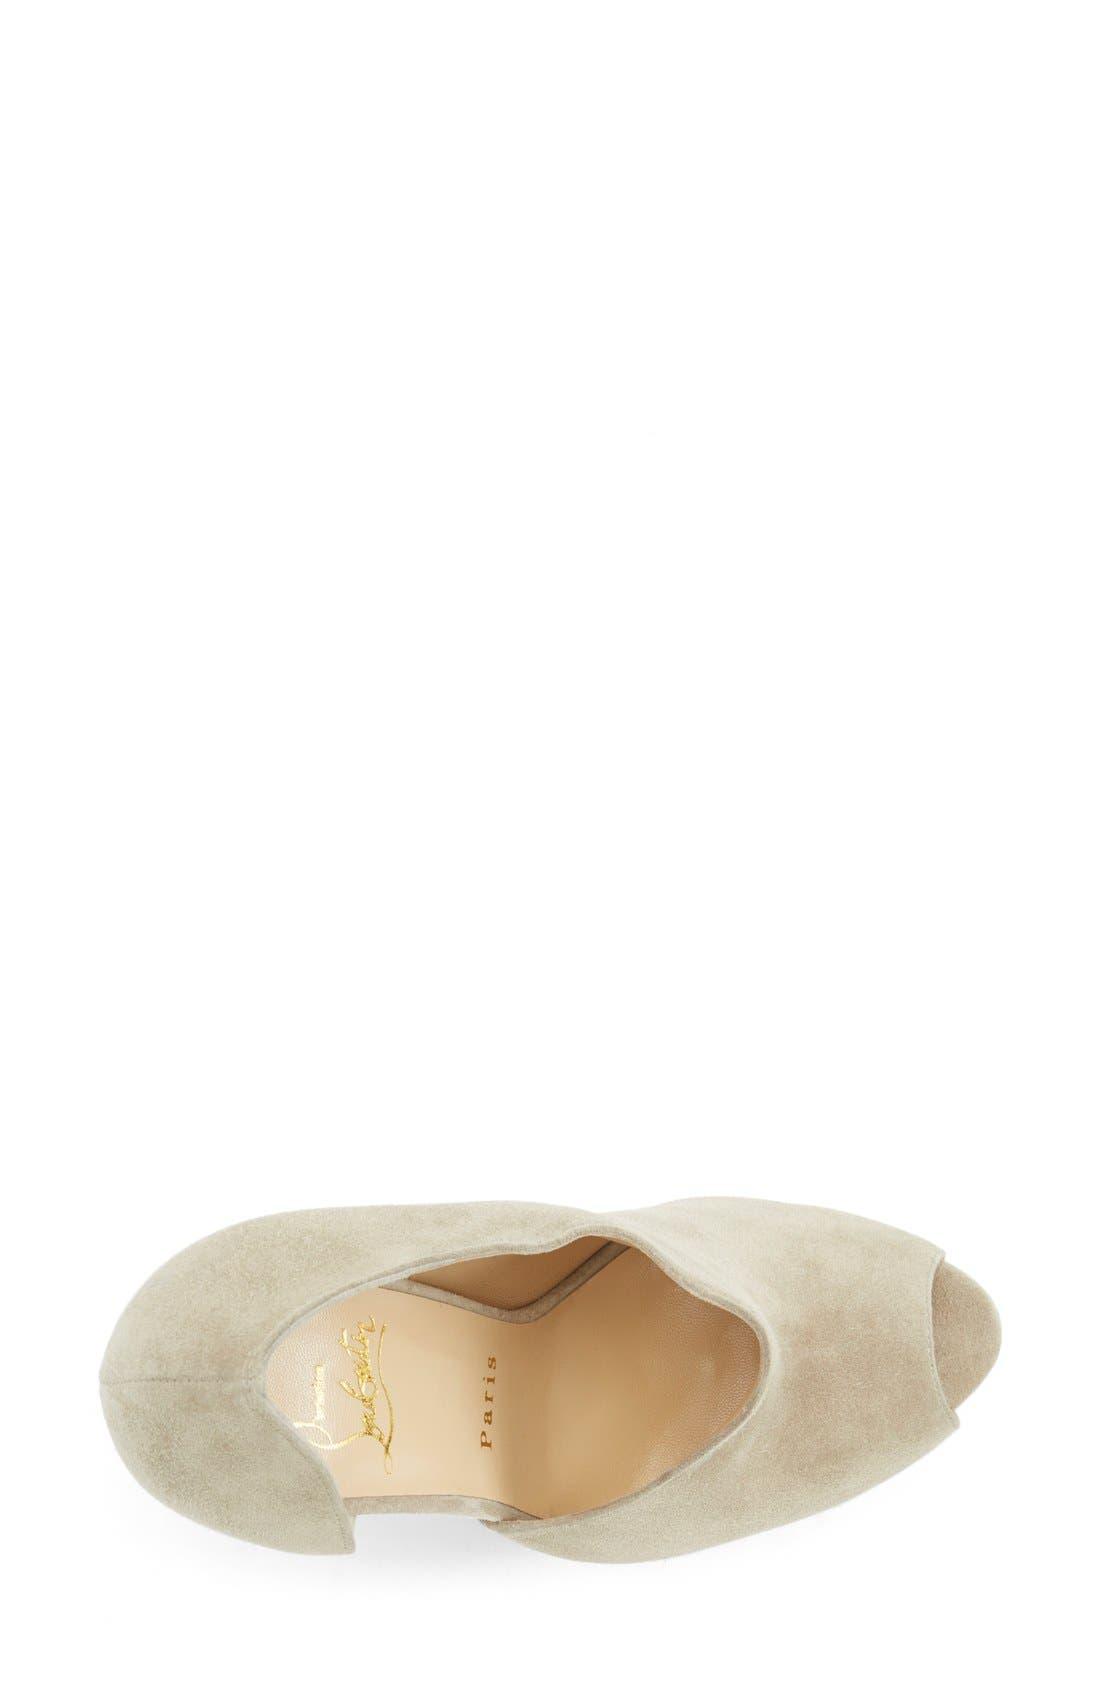 Alternate Image 3  - Christian Louboutin 'Verita' Cutout Platform Peep Toe Bootie